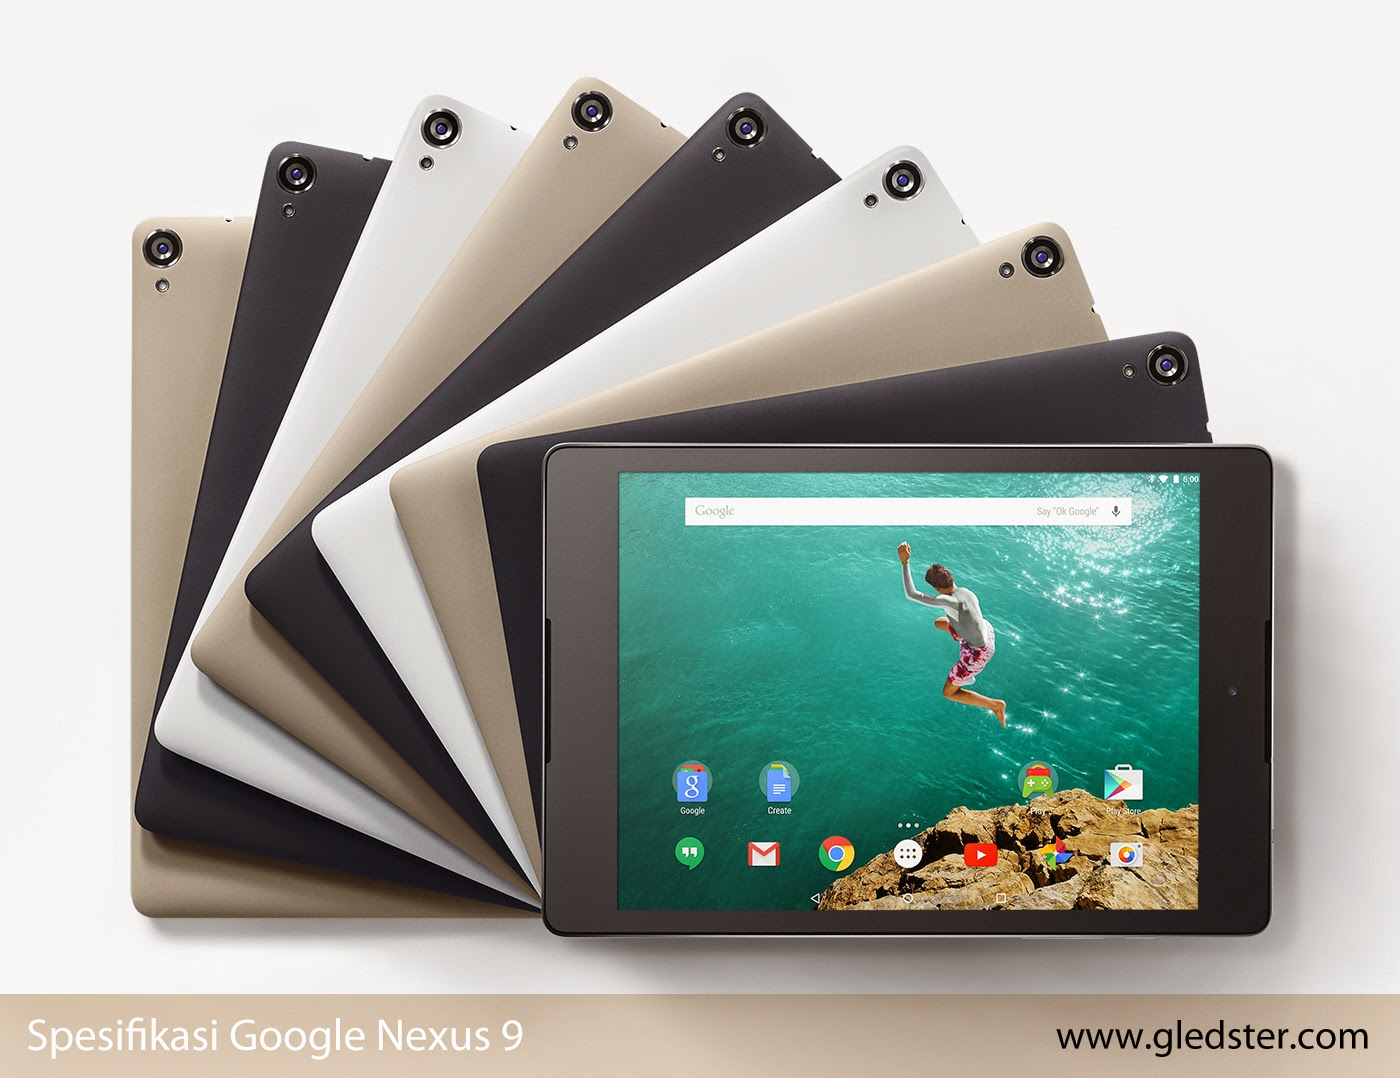 Spesifikasi Google Nexus 9